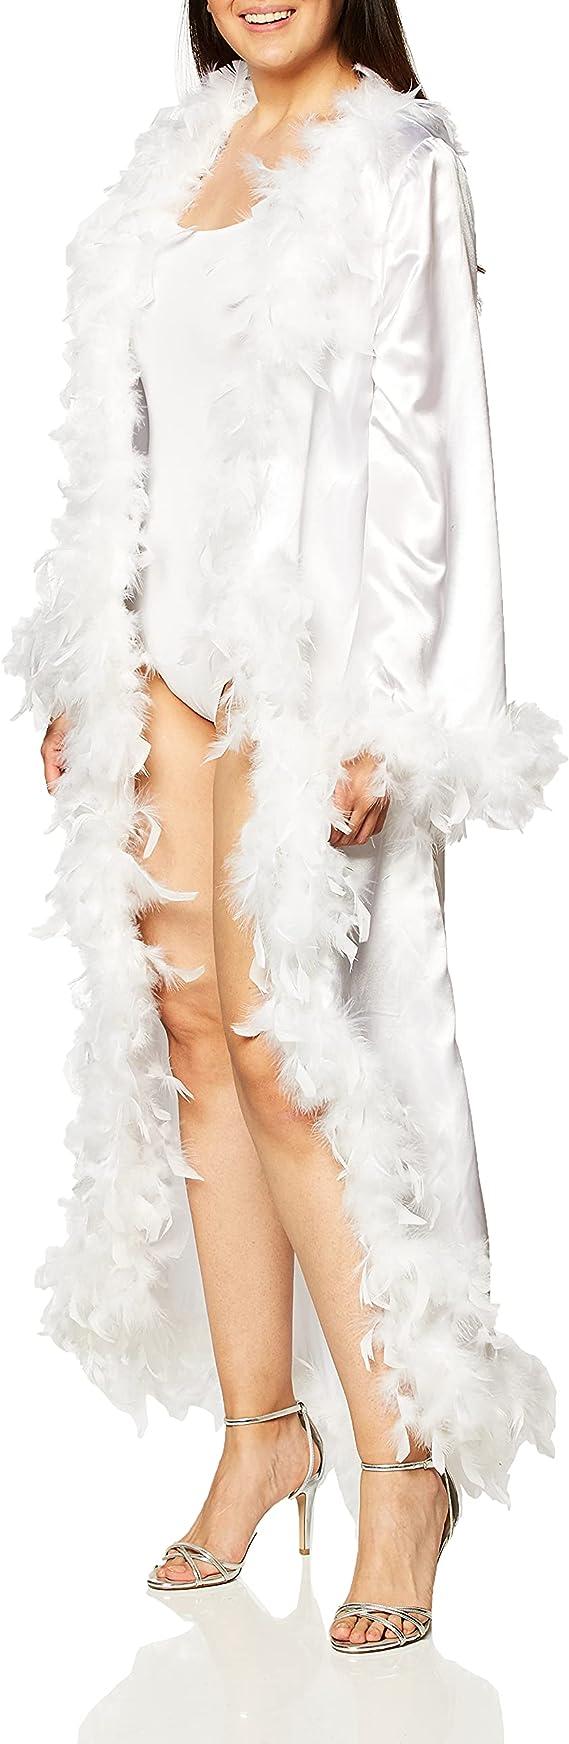 1930s Costumes- Bride of Frankenstein, Betty Boop, Olive Oyl, Bonnie & Clyde Forum Novelties Womens Vintage Hollywood Marabou Robe  AT vintagedancer.com